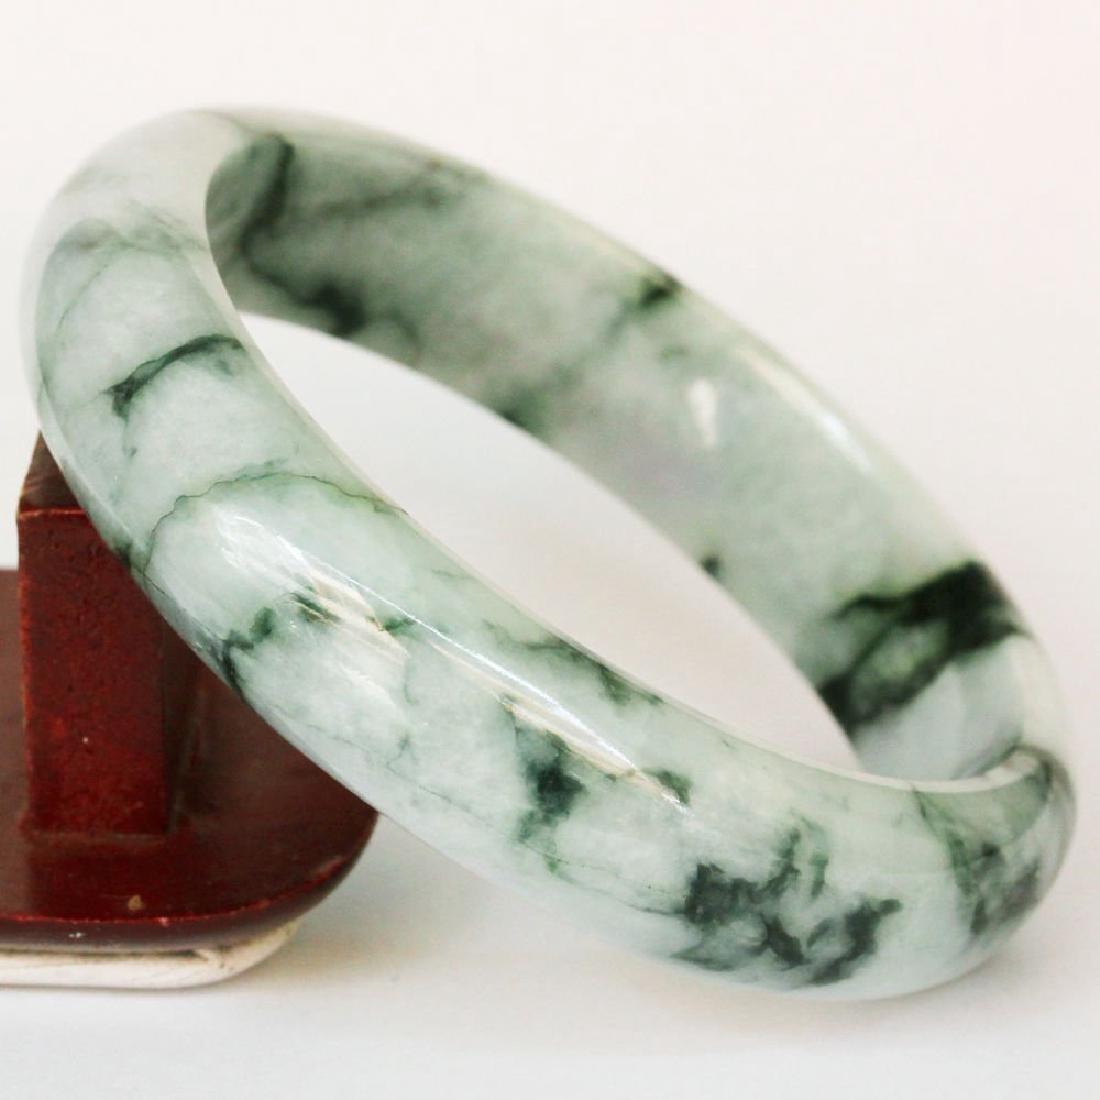 Natural Jadeite Bangle: 63 mm